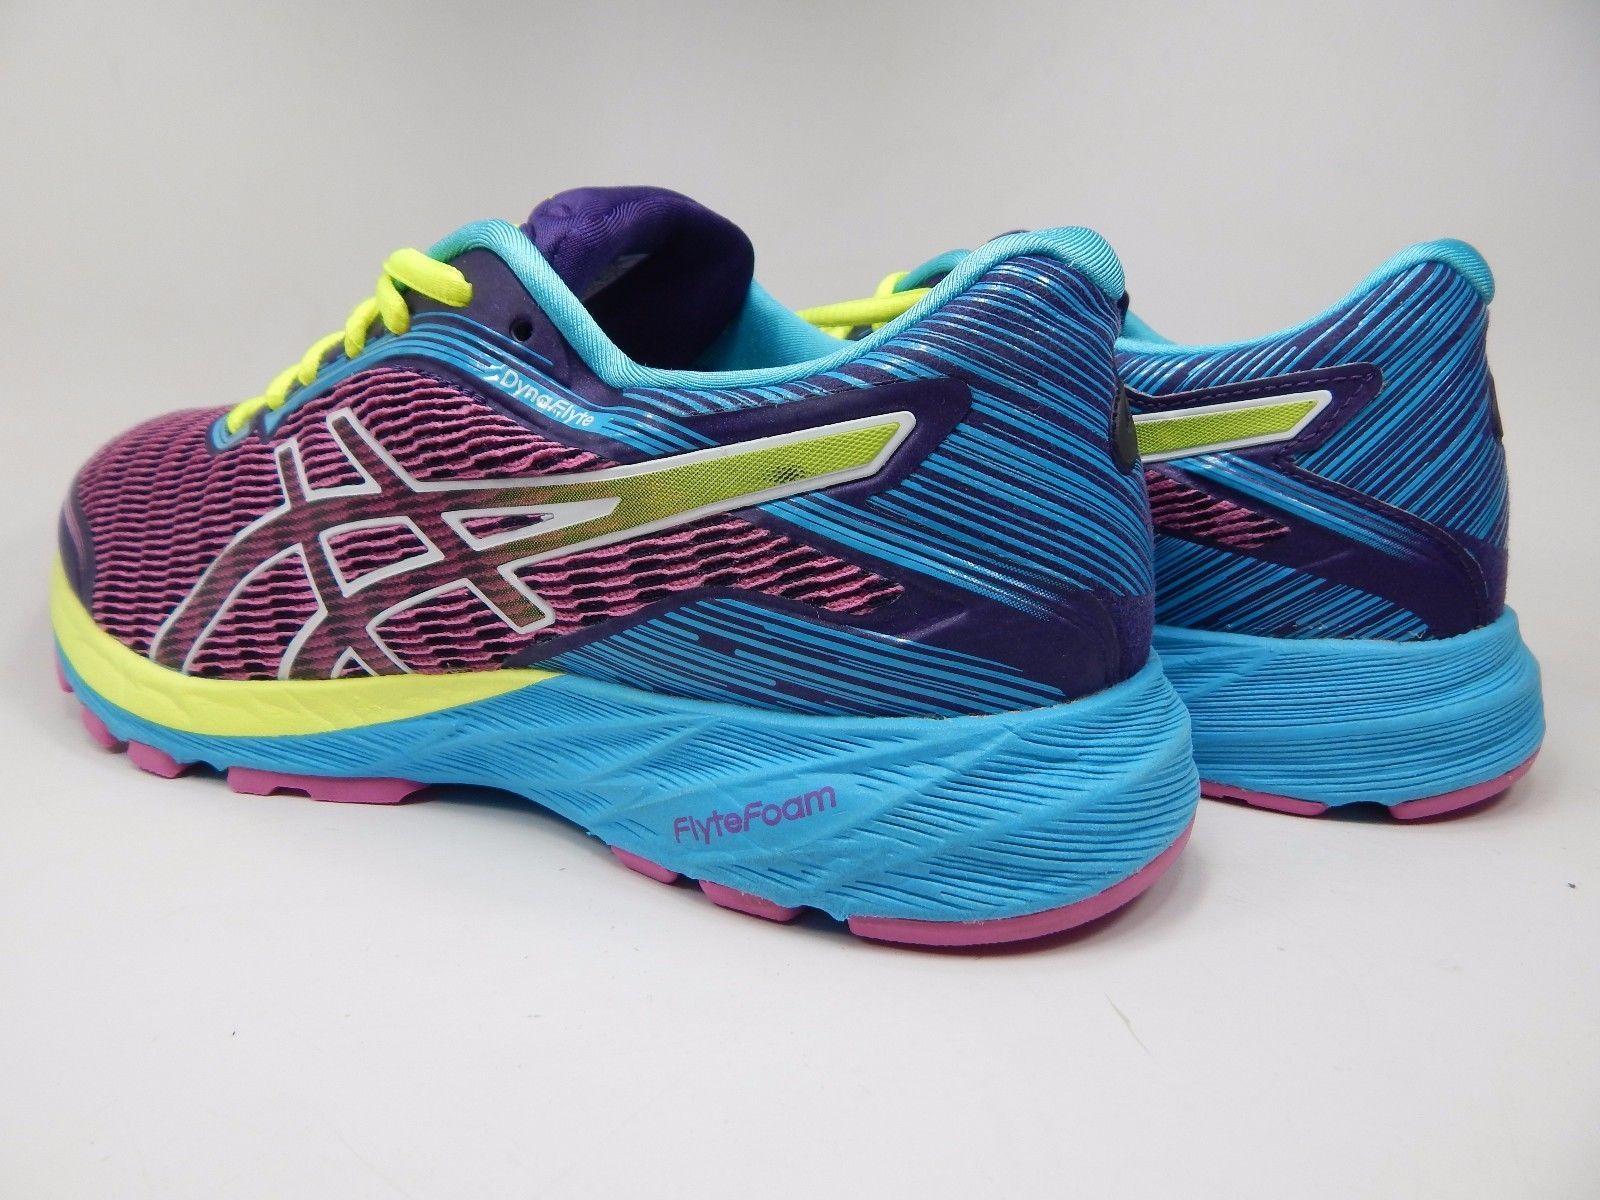 Asics Dynaflyte Women's Running Shoes Size US 8 M (B) EU 39.5 Purple Pink T6F8Y